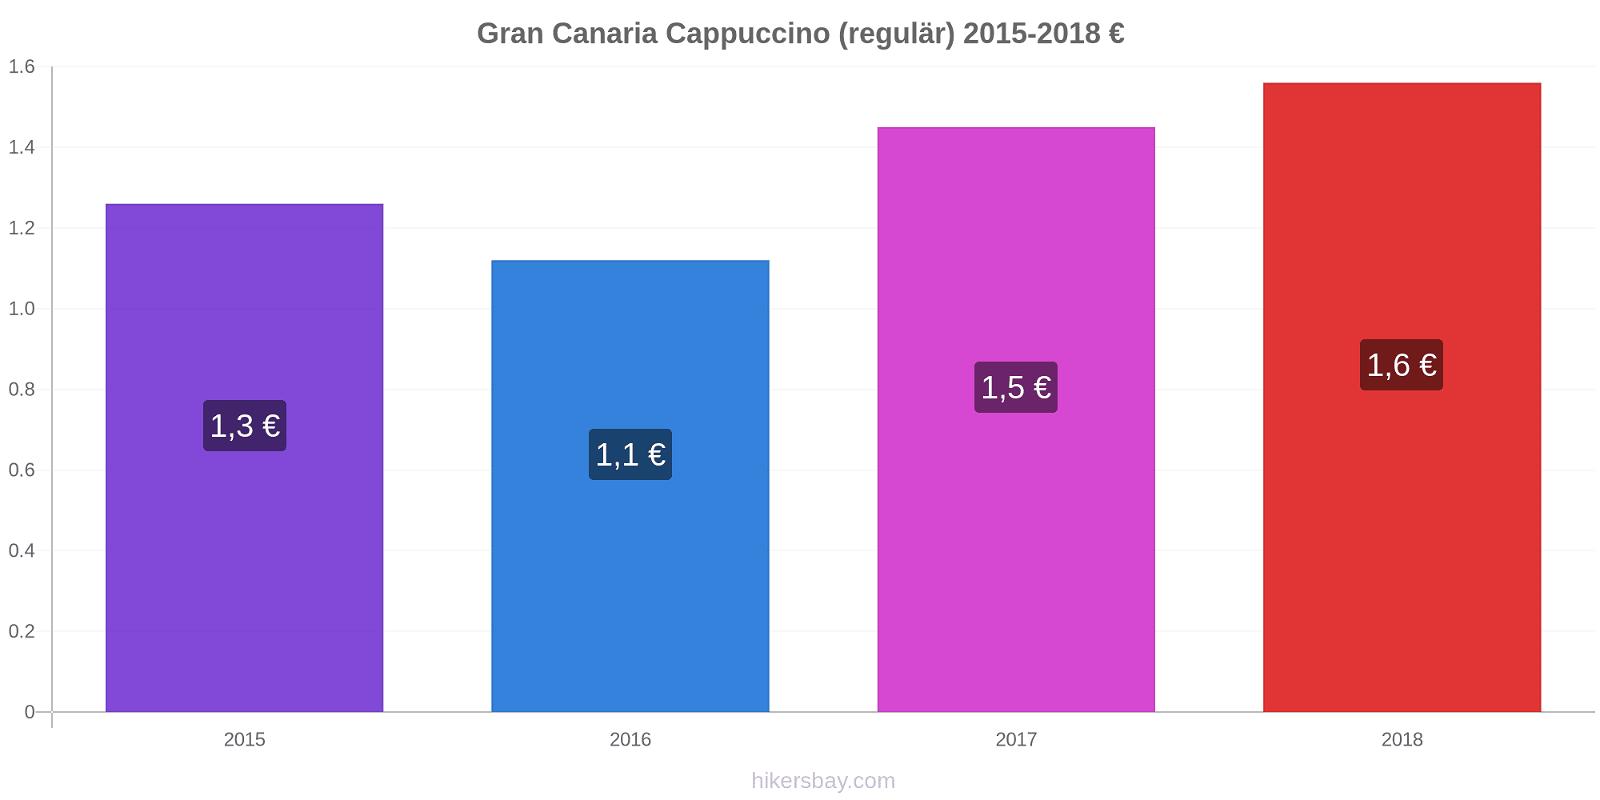 Gran Canaria Preisänderungen Cappuccino (regulär) hikersbay.com